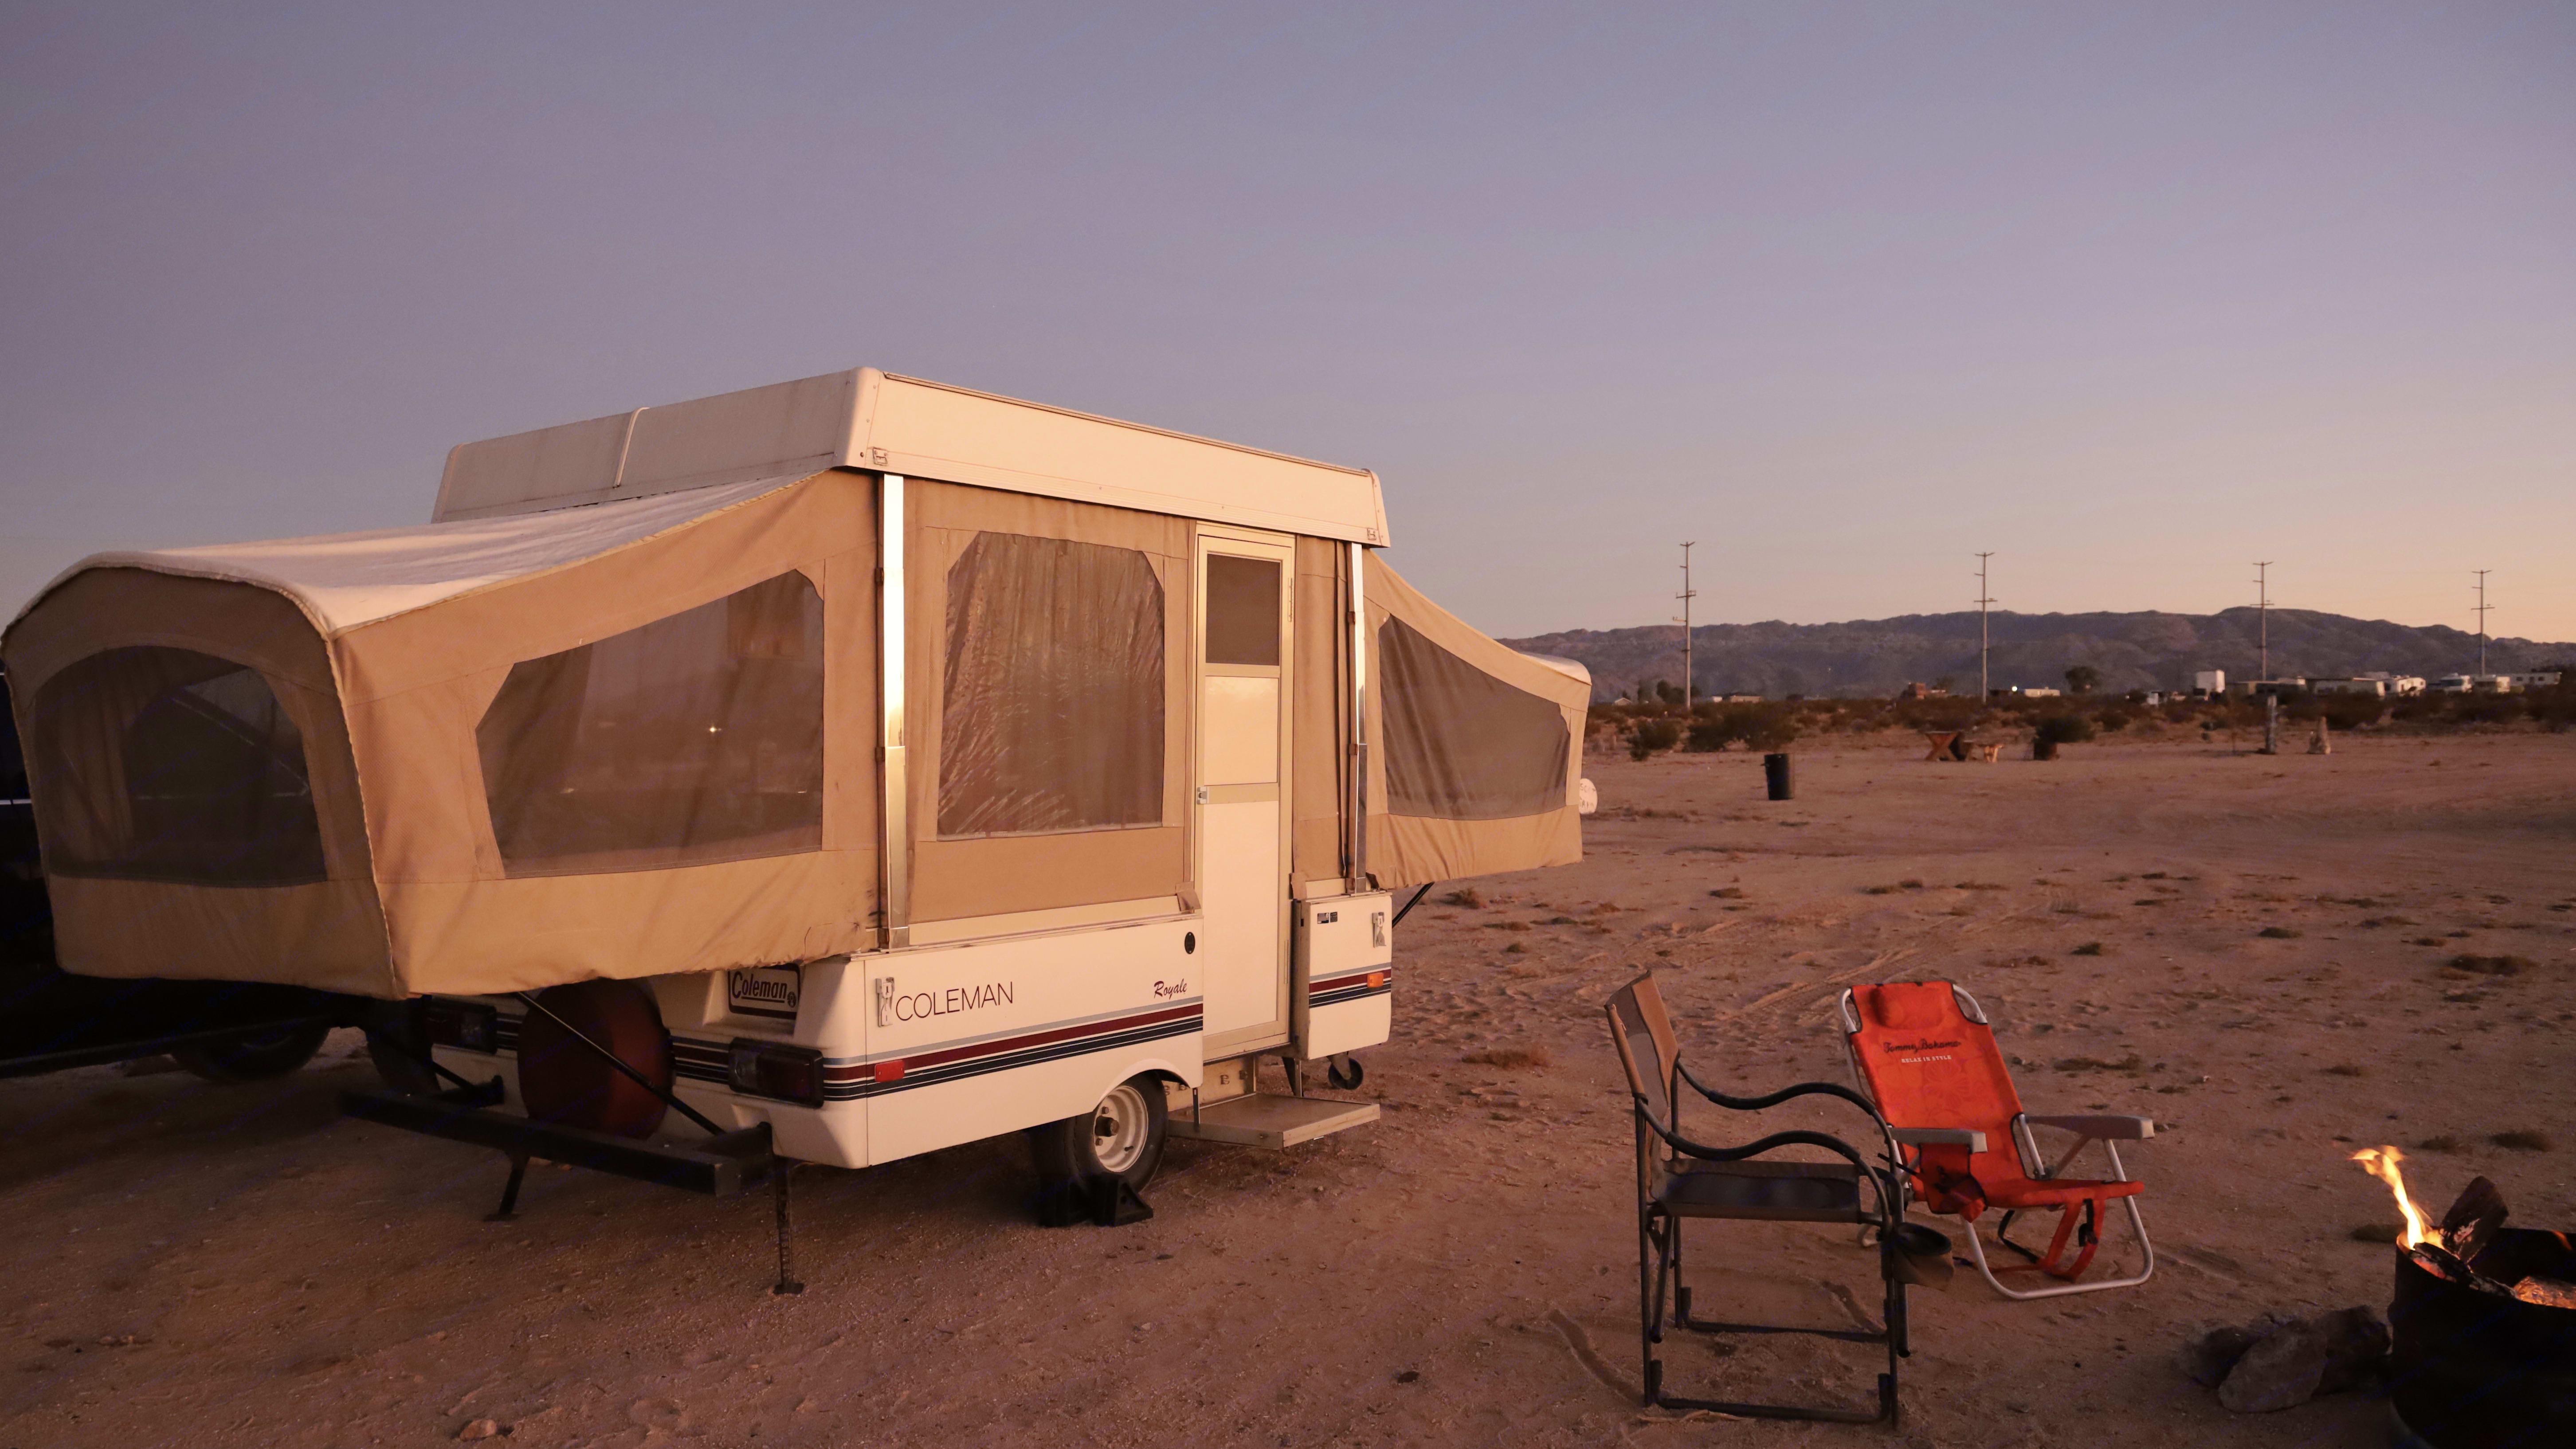 Sunset in the desert. Coleman Royal 1985